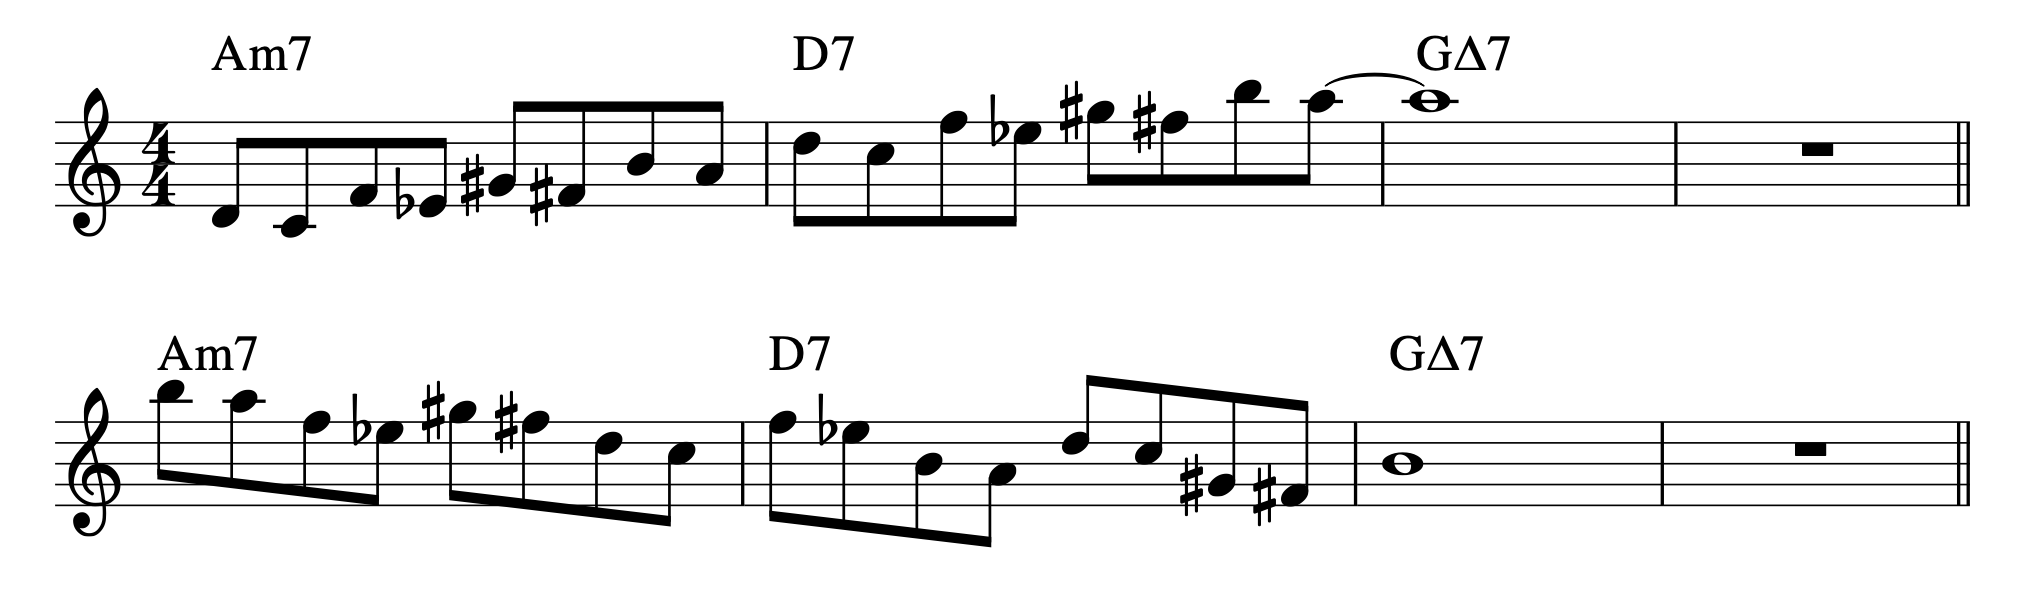 diminish-phrase-6